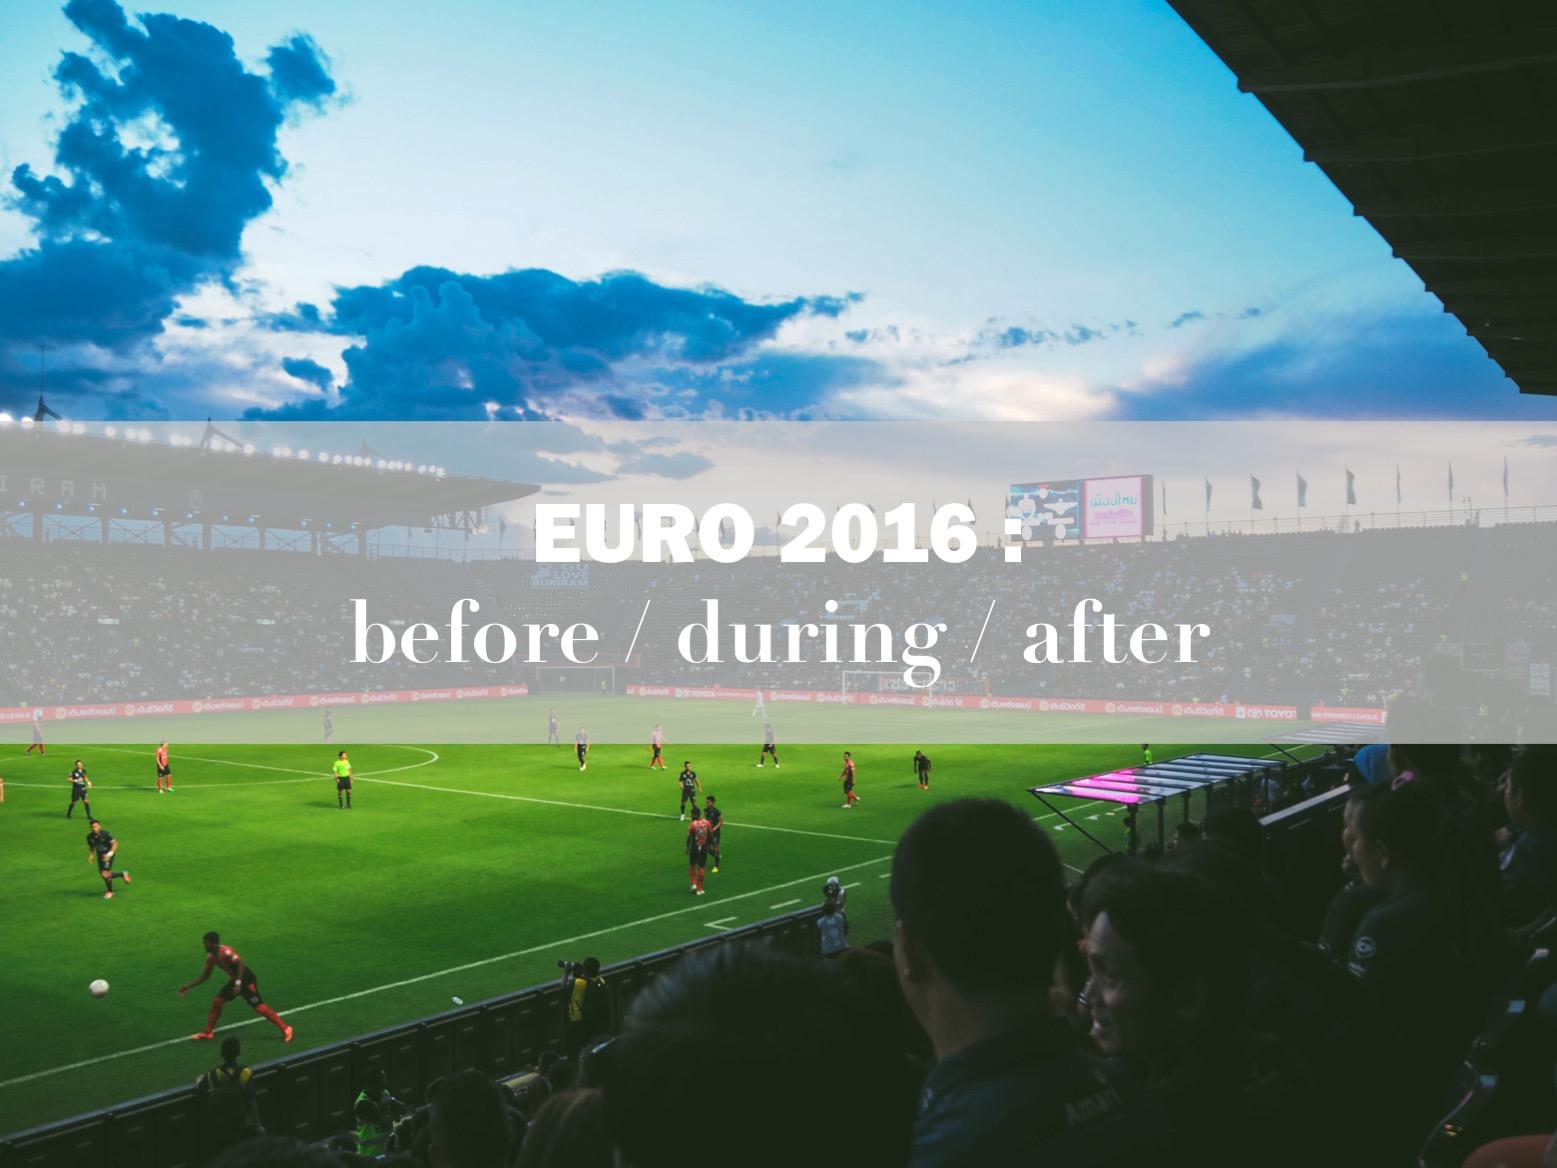 stadium,football,soccer,spectator,audience,cheer